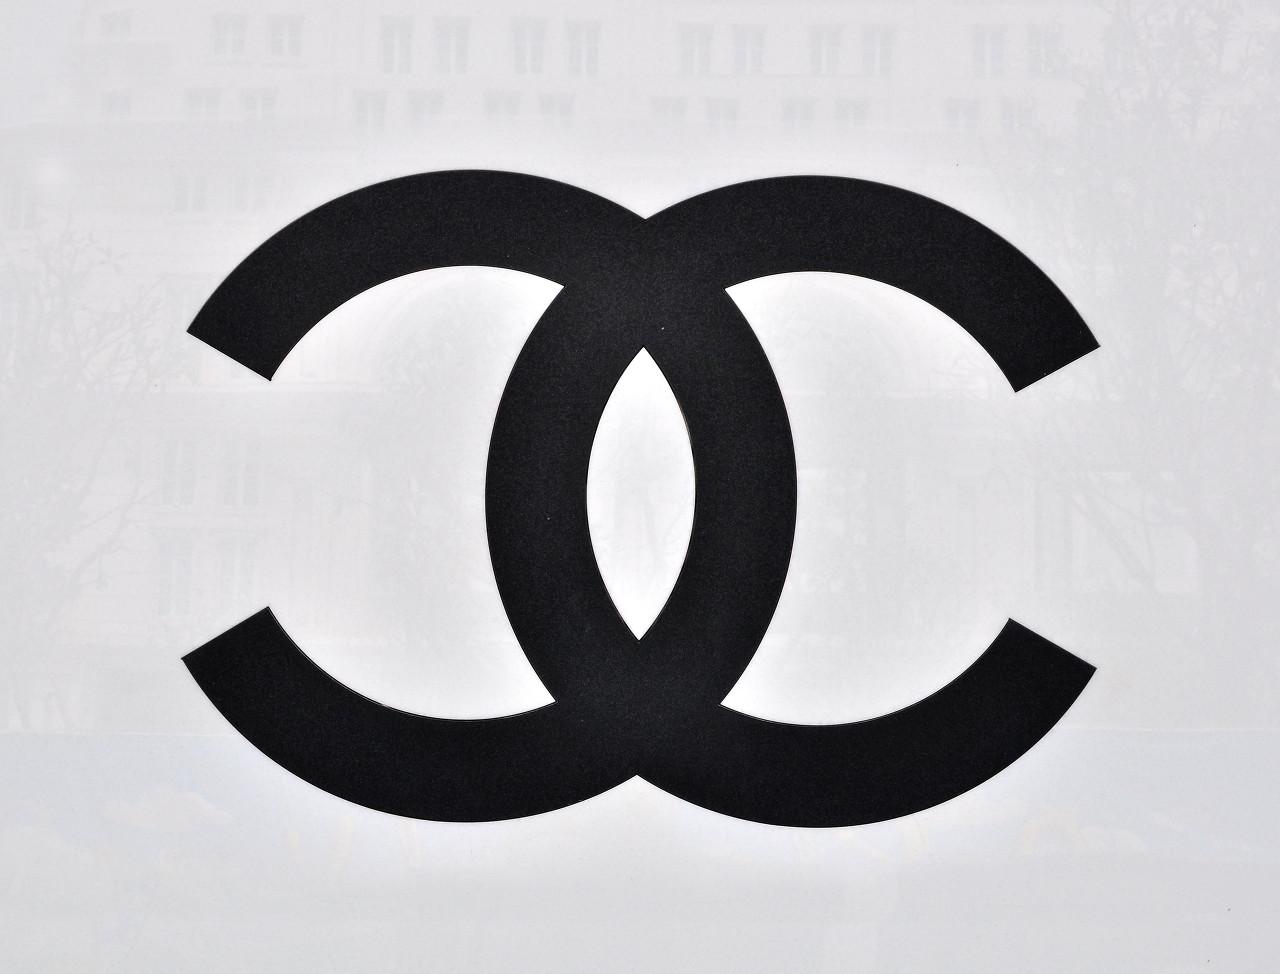 庆祝Chanel五号香水诞生100周年 Chanel将联合法国邮政推出两款限量版邮票